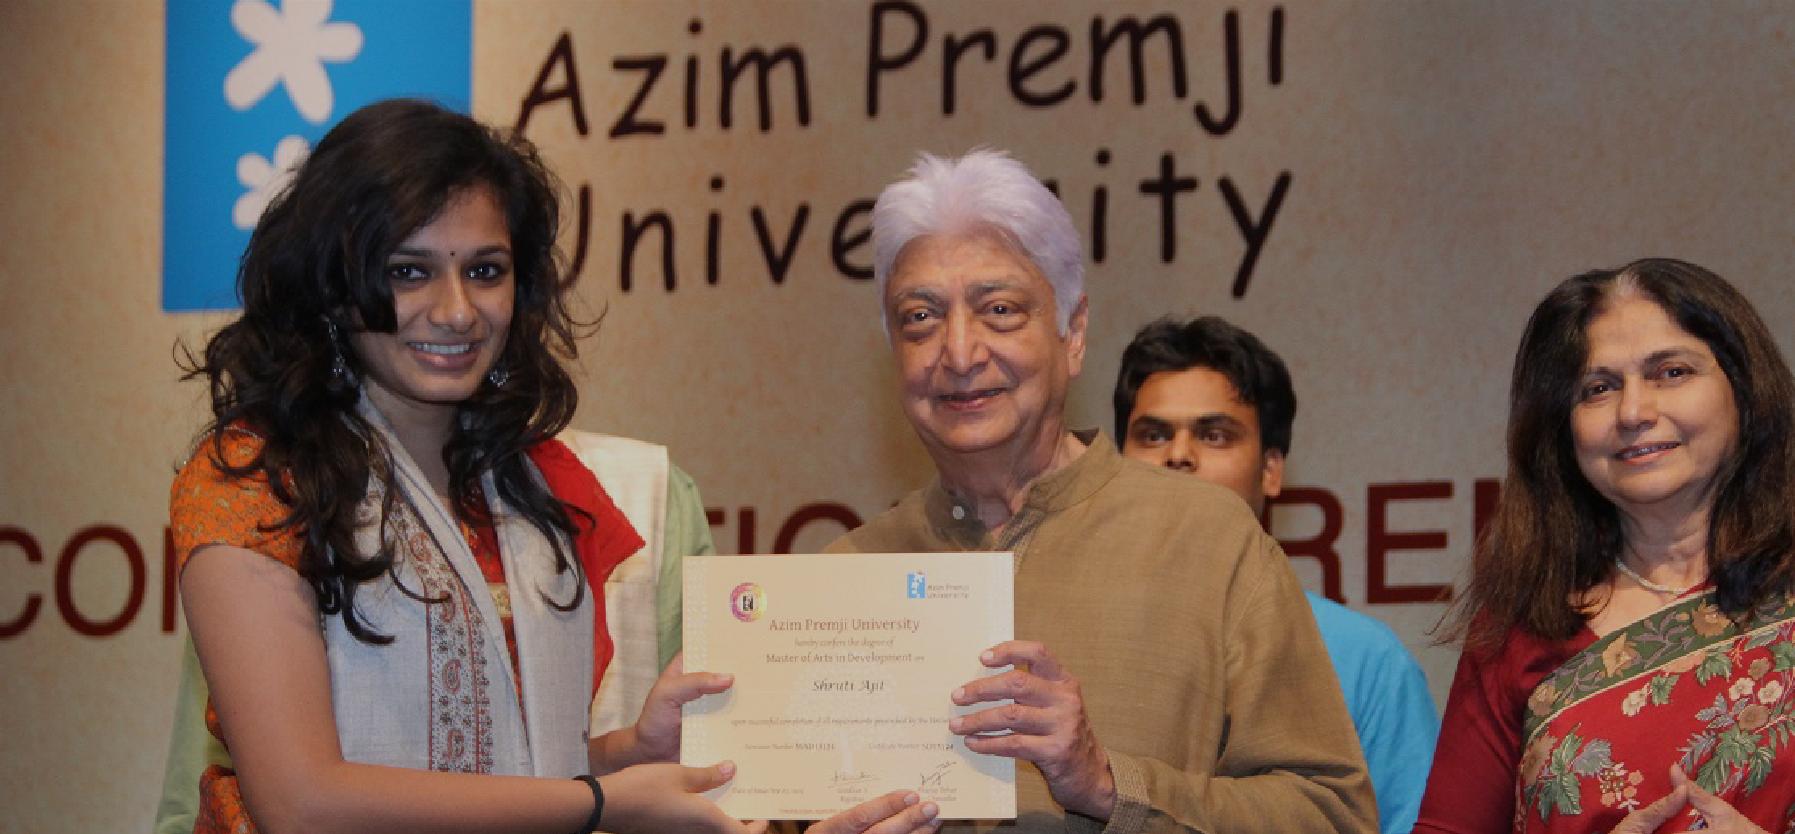 Azim Premji - Top entrepreneurs of the world